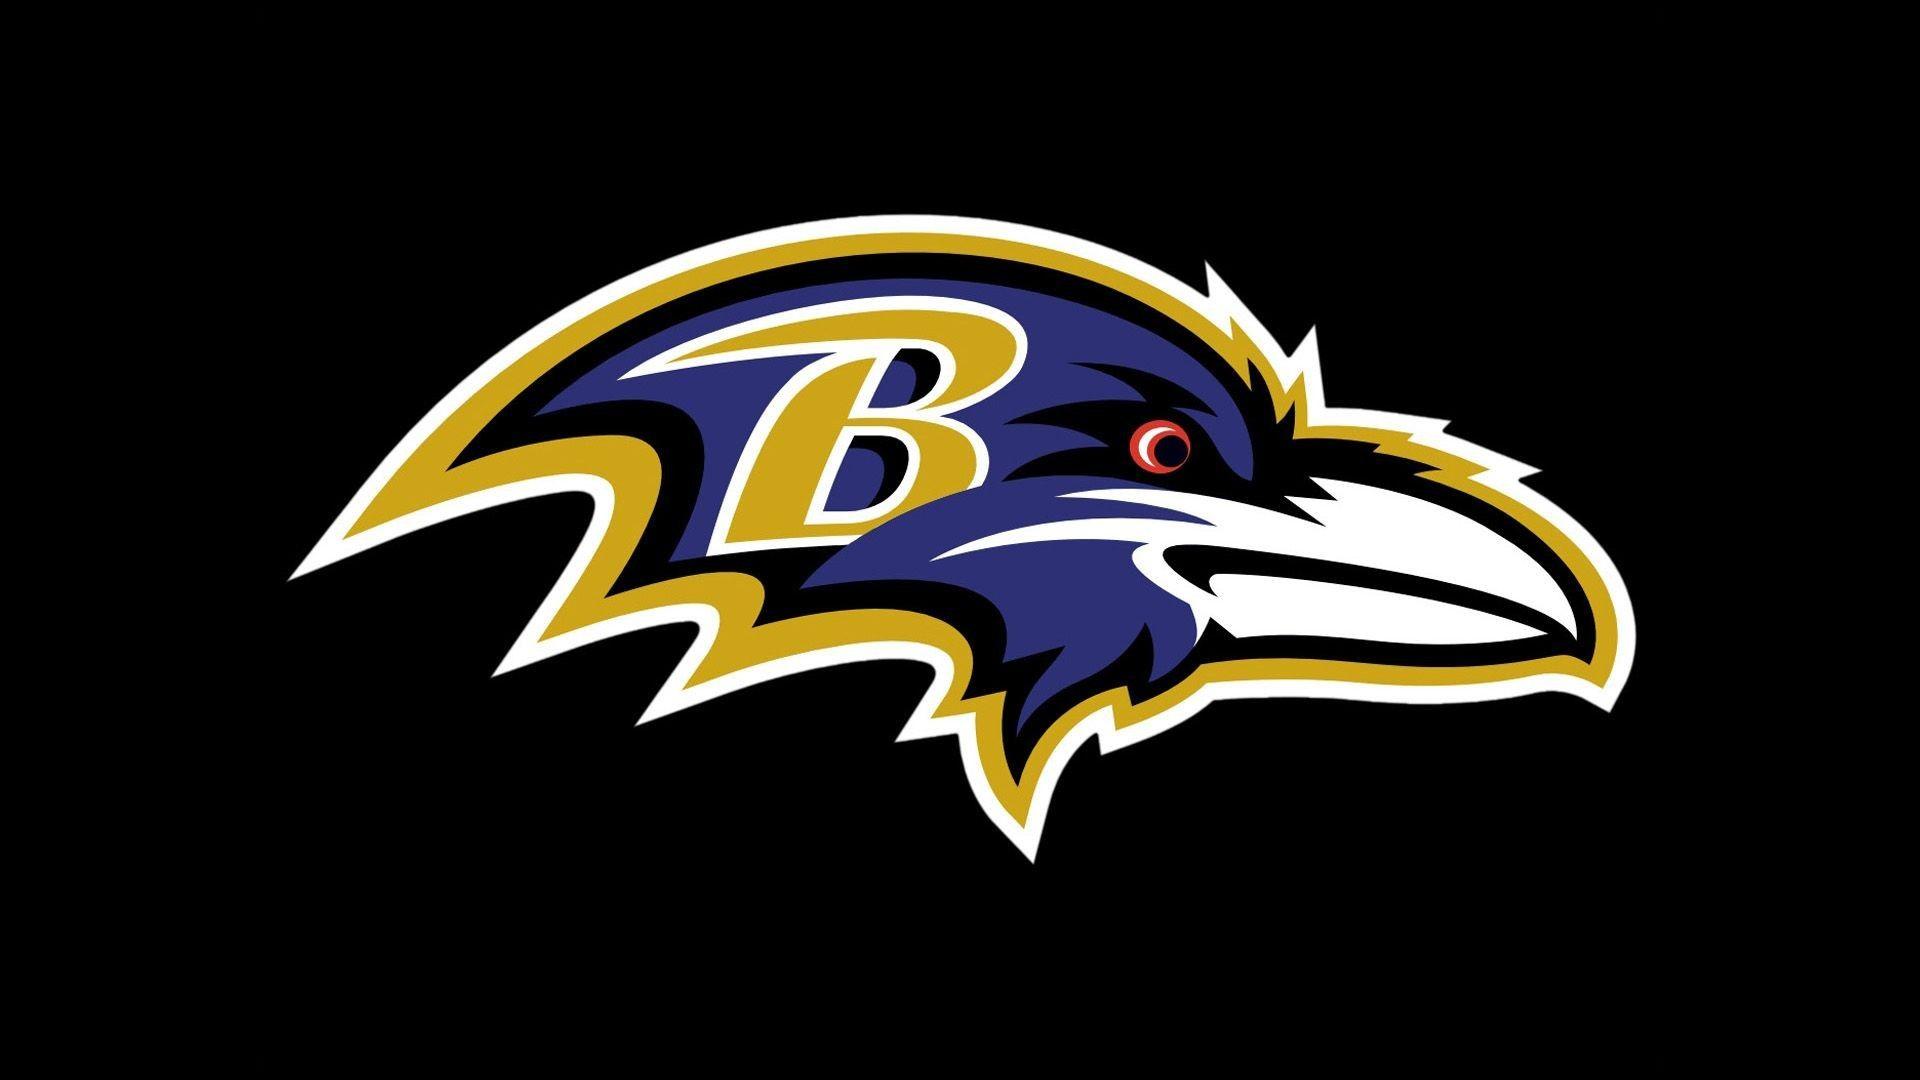 Baltimore Ravens For Desktop Wallpaper   Baltimore ravens ...